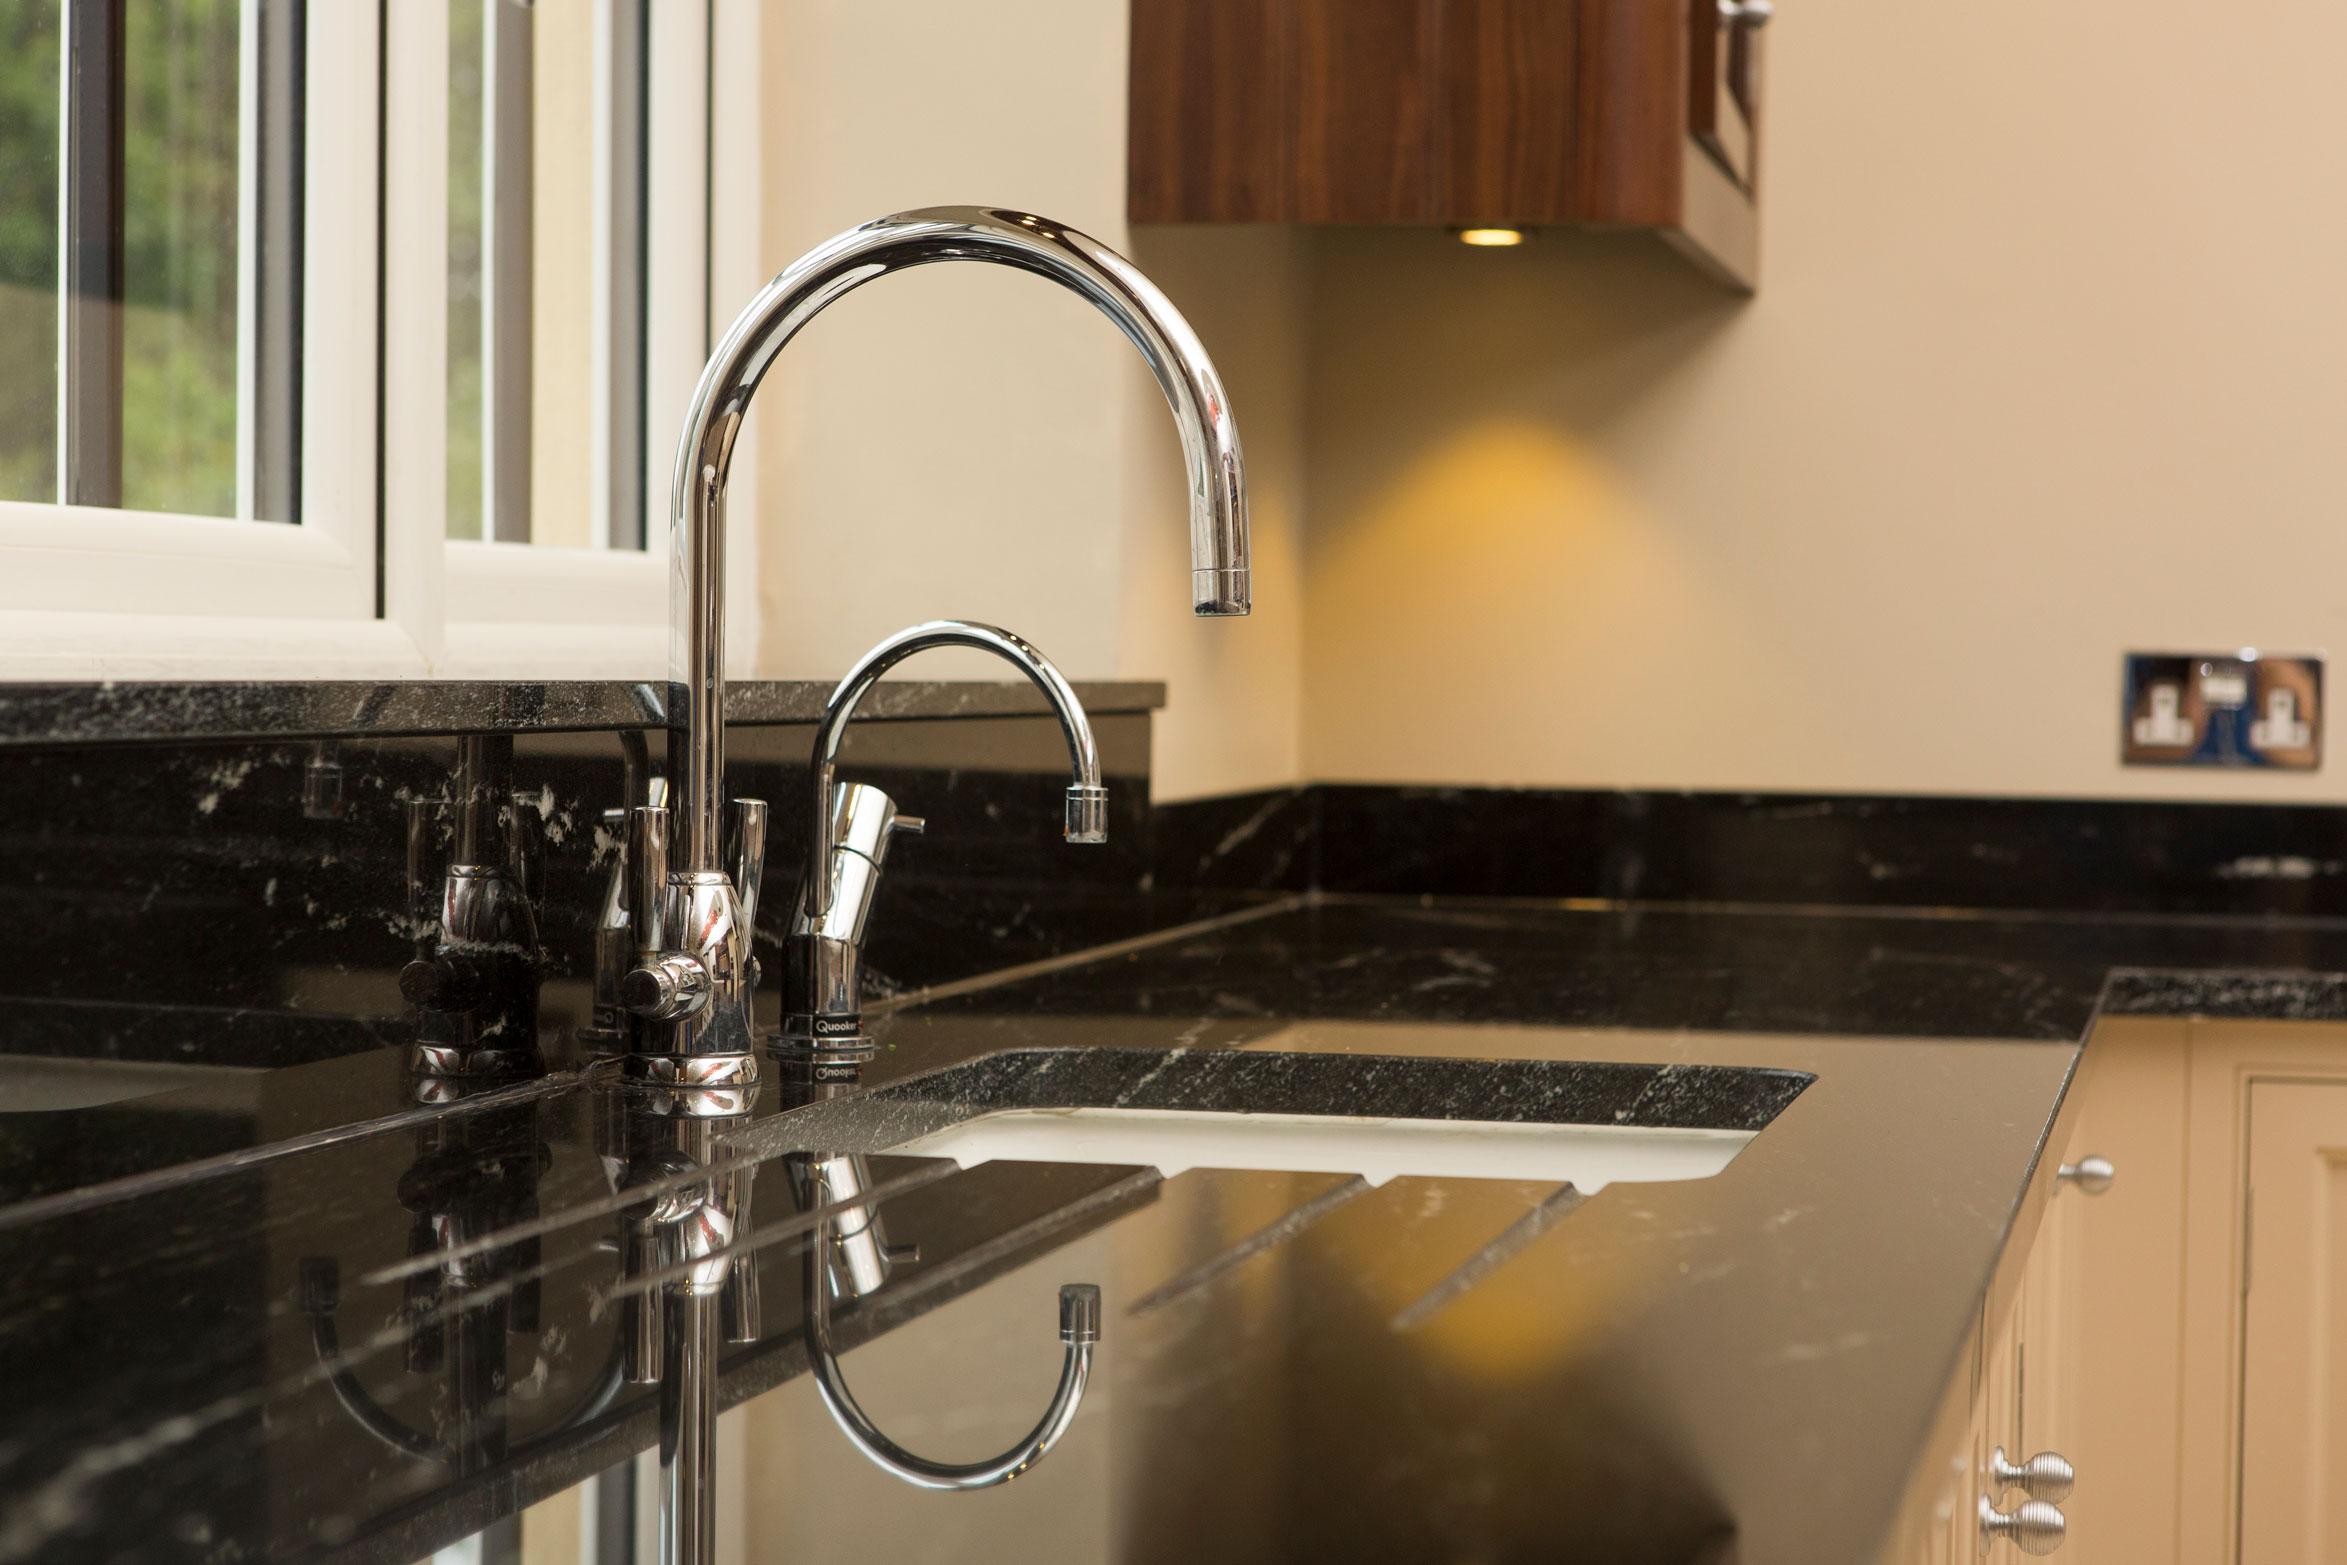 image of kitchen tap